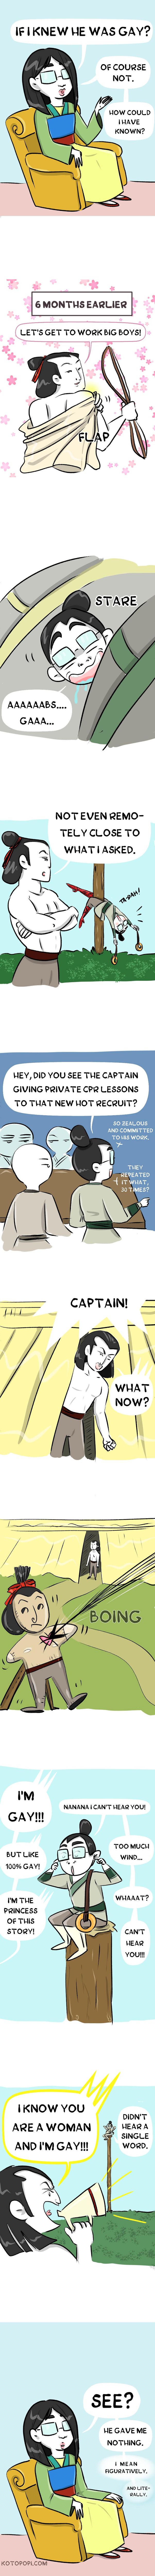 funny comics about disney mulan